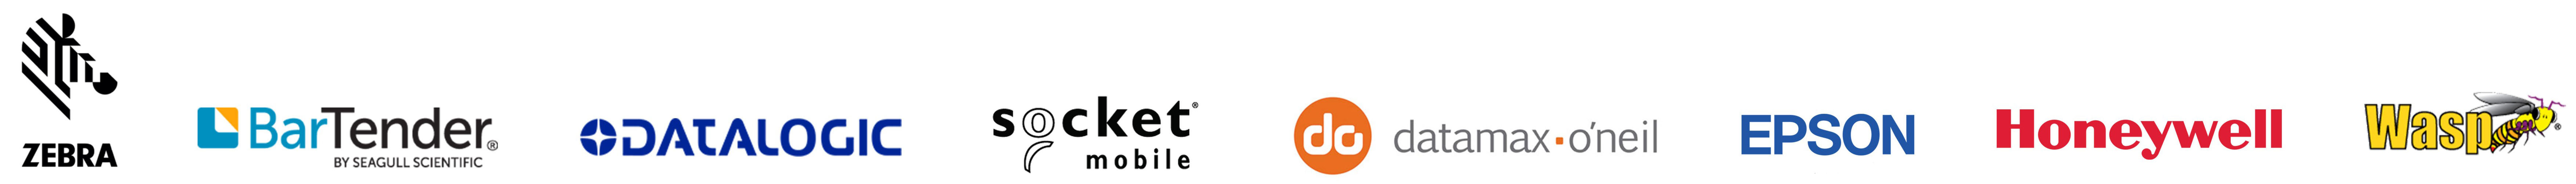 footer-brands.jpg